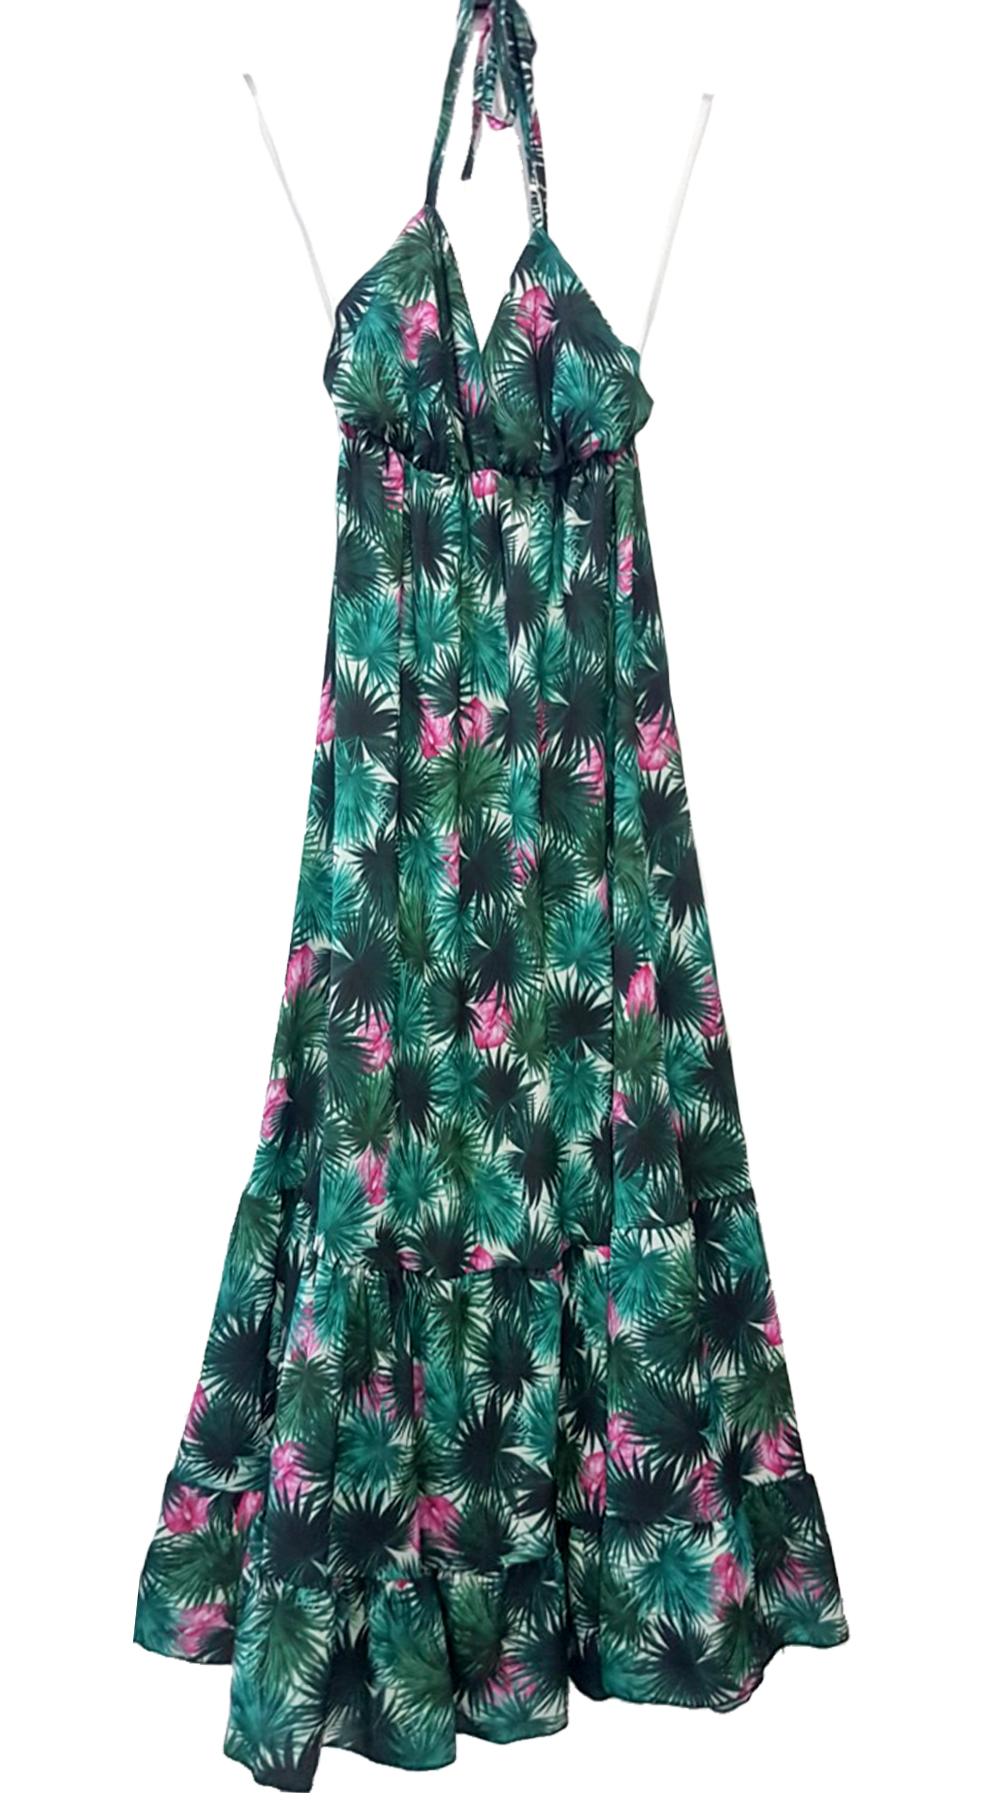 6e583e085fc7 Maxi Φλοράλ Φόρεμα με βολάν   Υπέροχα φλοράλ φορέματα   missreina.com